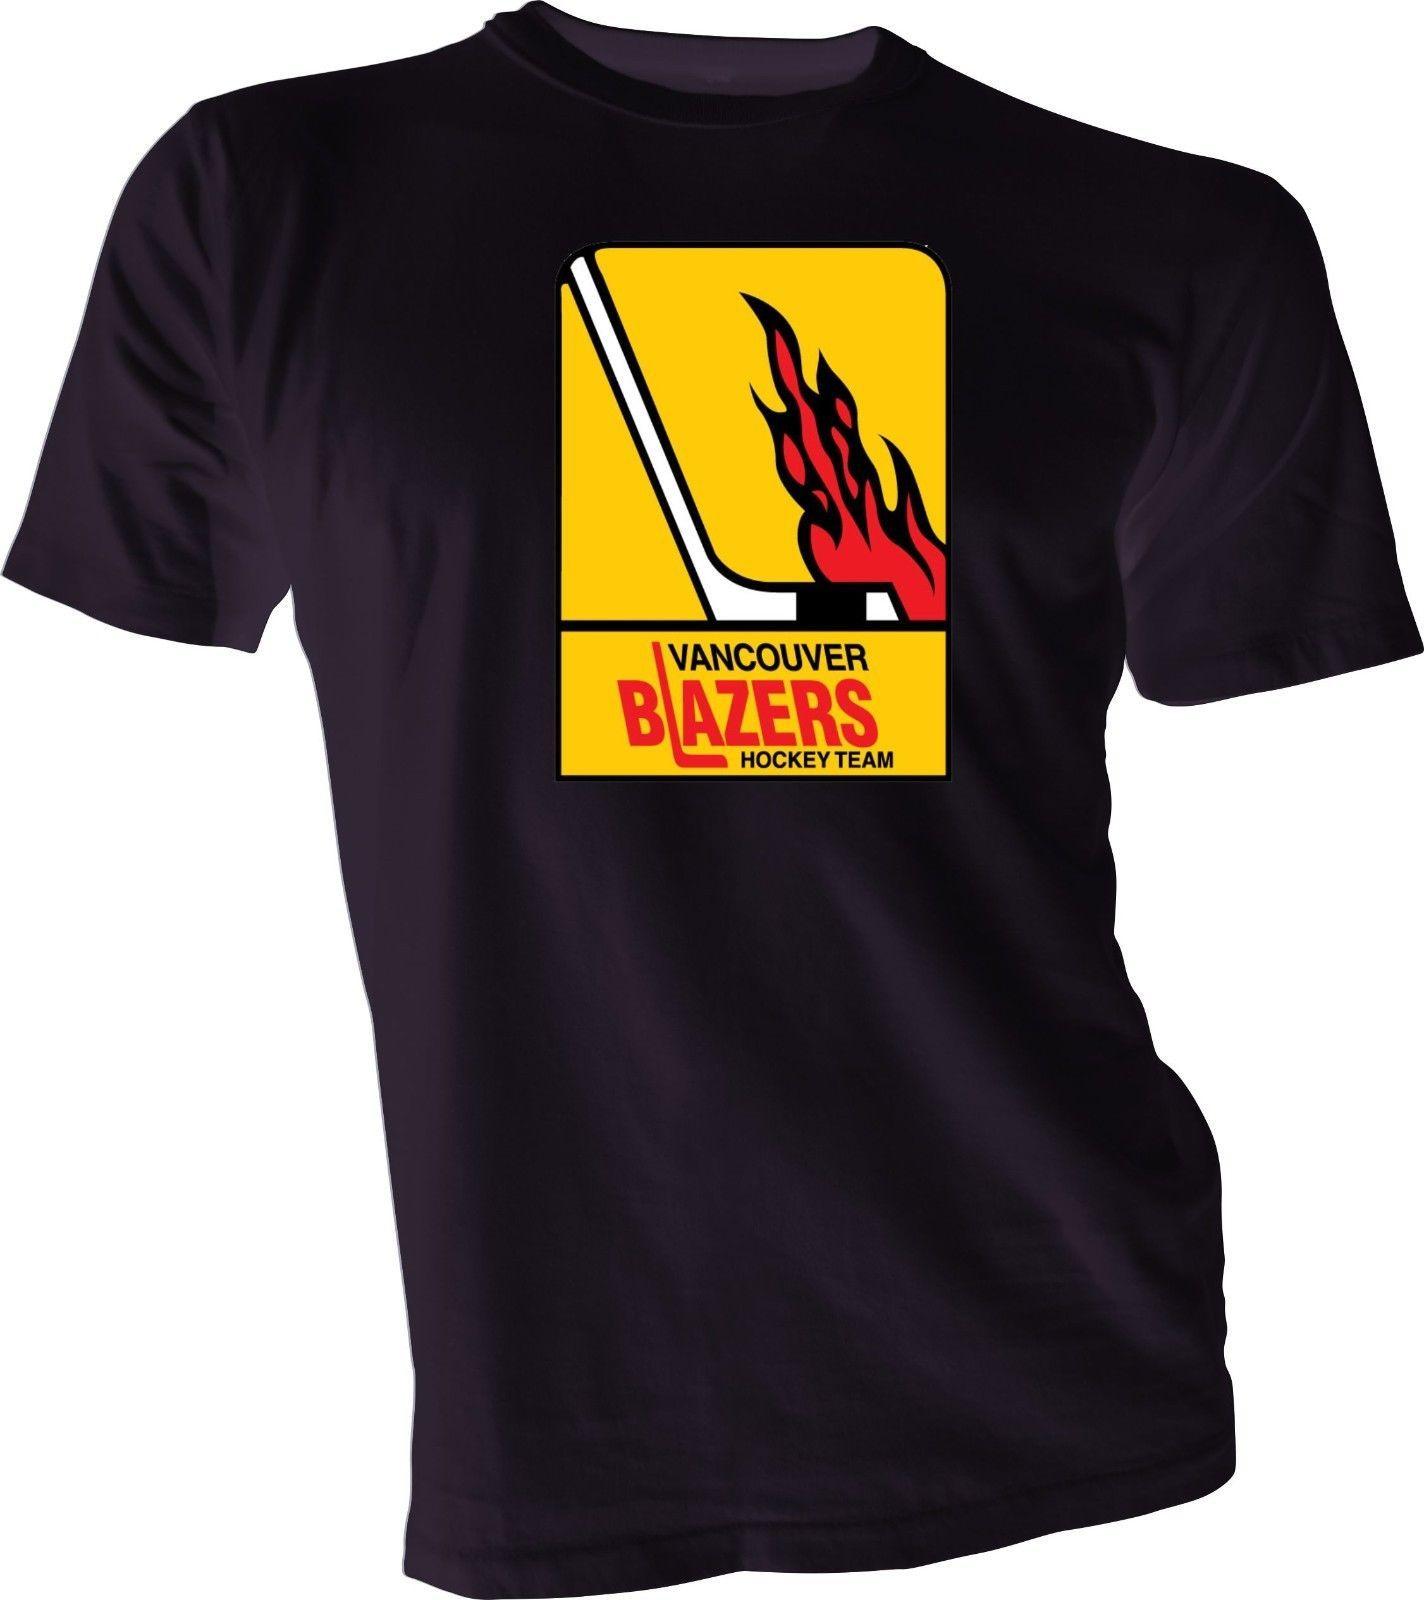 Vancouver Blazers Defunct Wha Hockeyer Vintage Style Black T Shirt